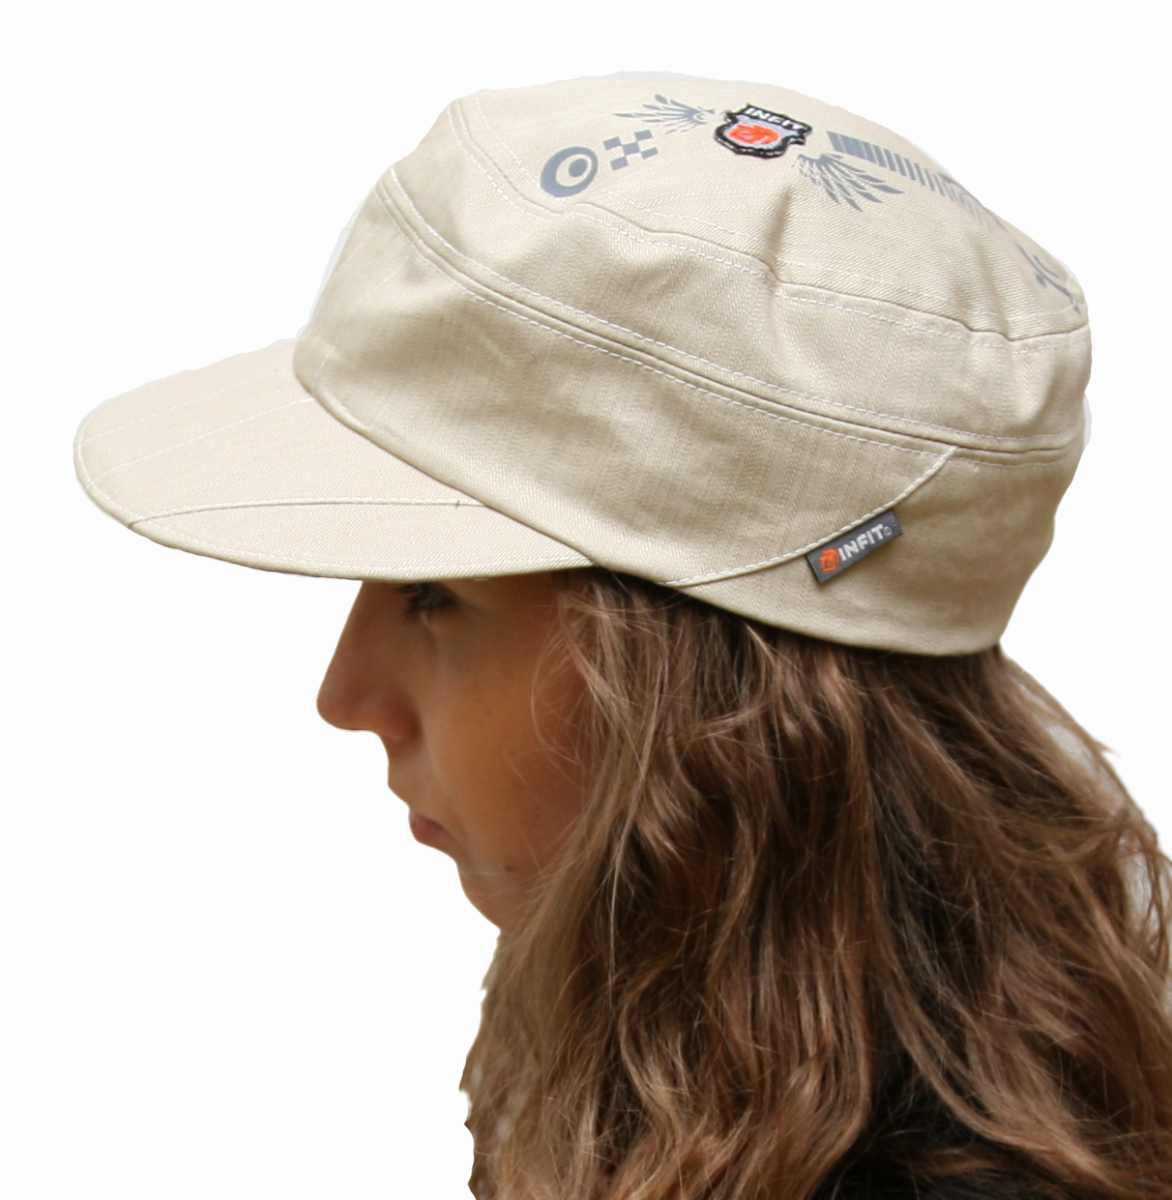 Kšiltovka - sportovní baseballová čepice i na volný čas. ff0ab4883f